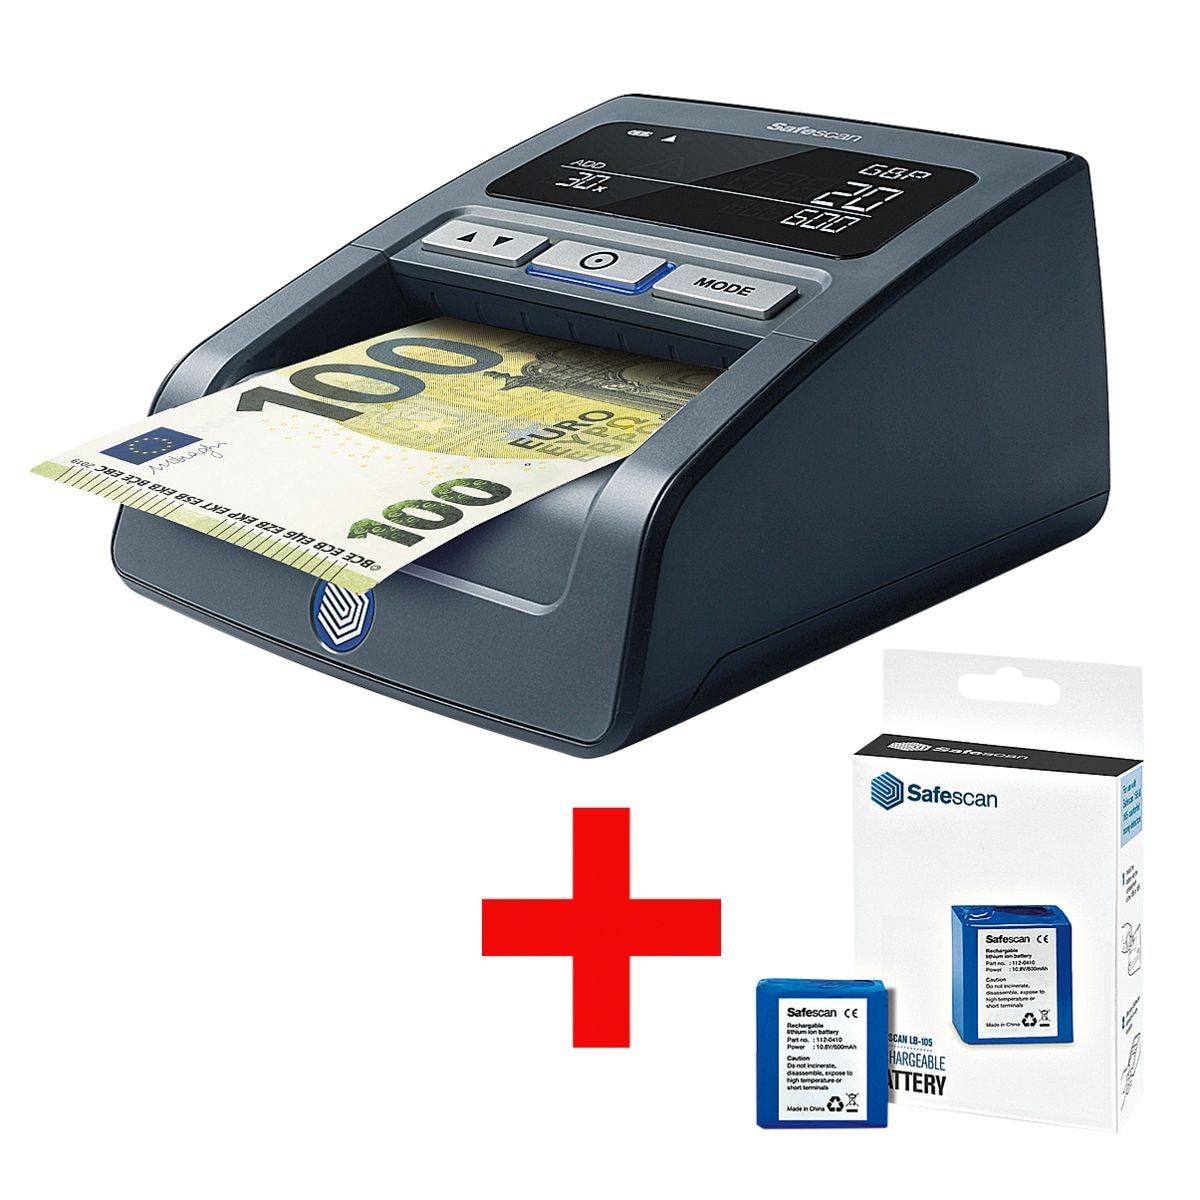 Safescan Geldscheinprüfgerät »155-s« inkl. passendem Akku »LB-105«